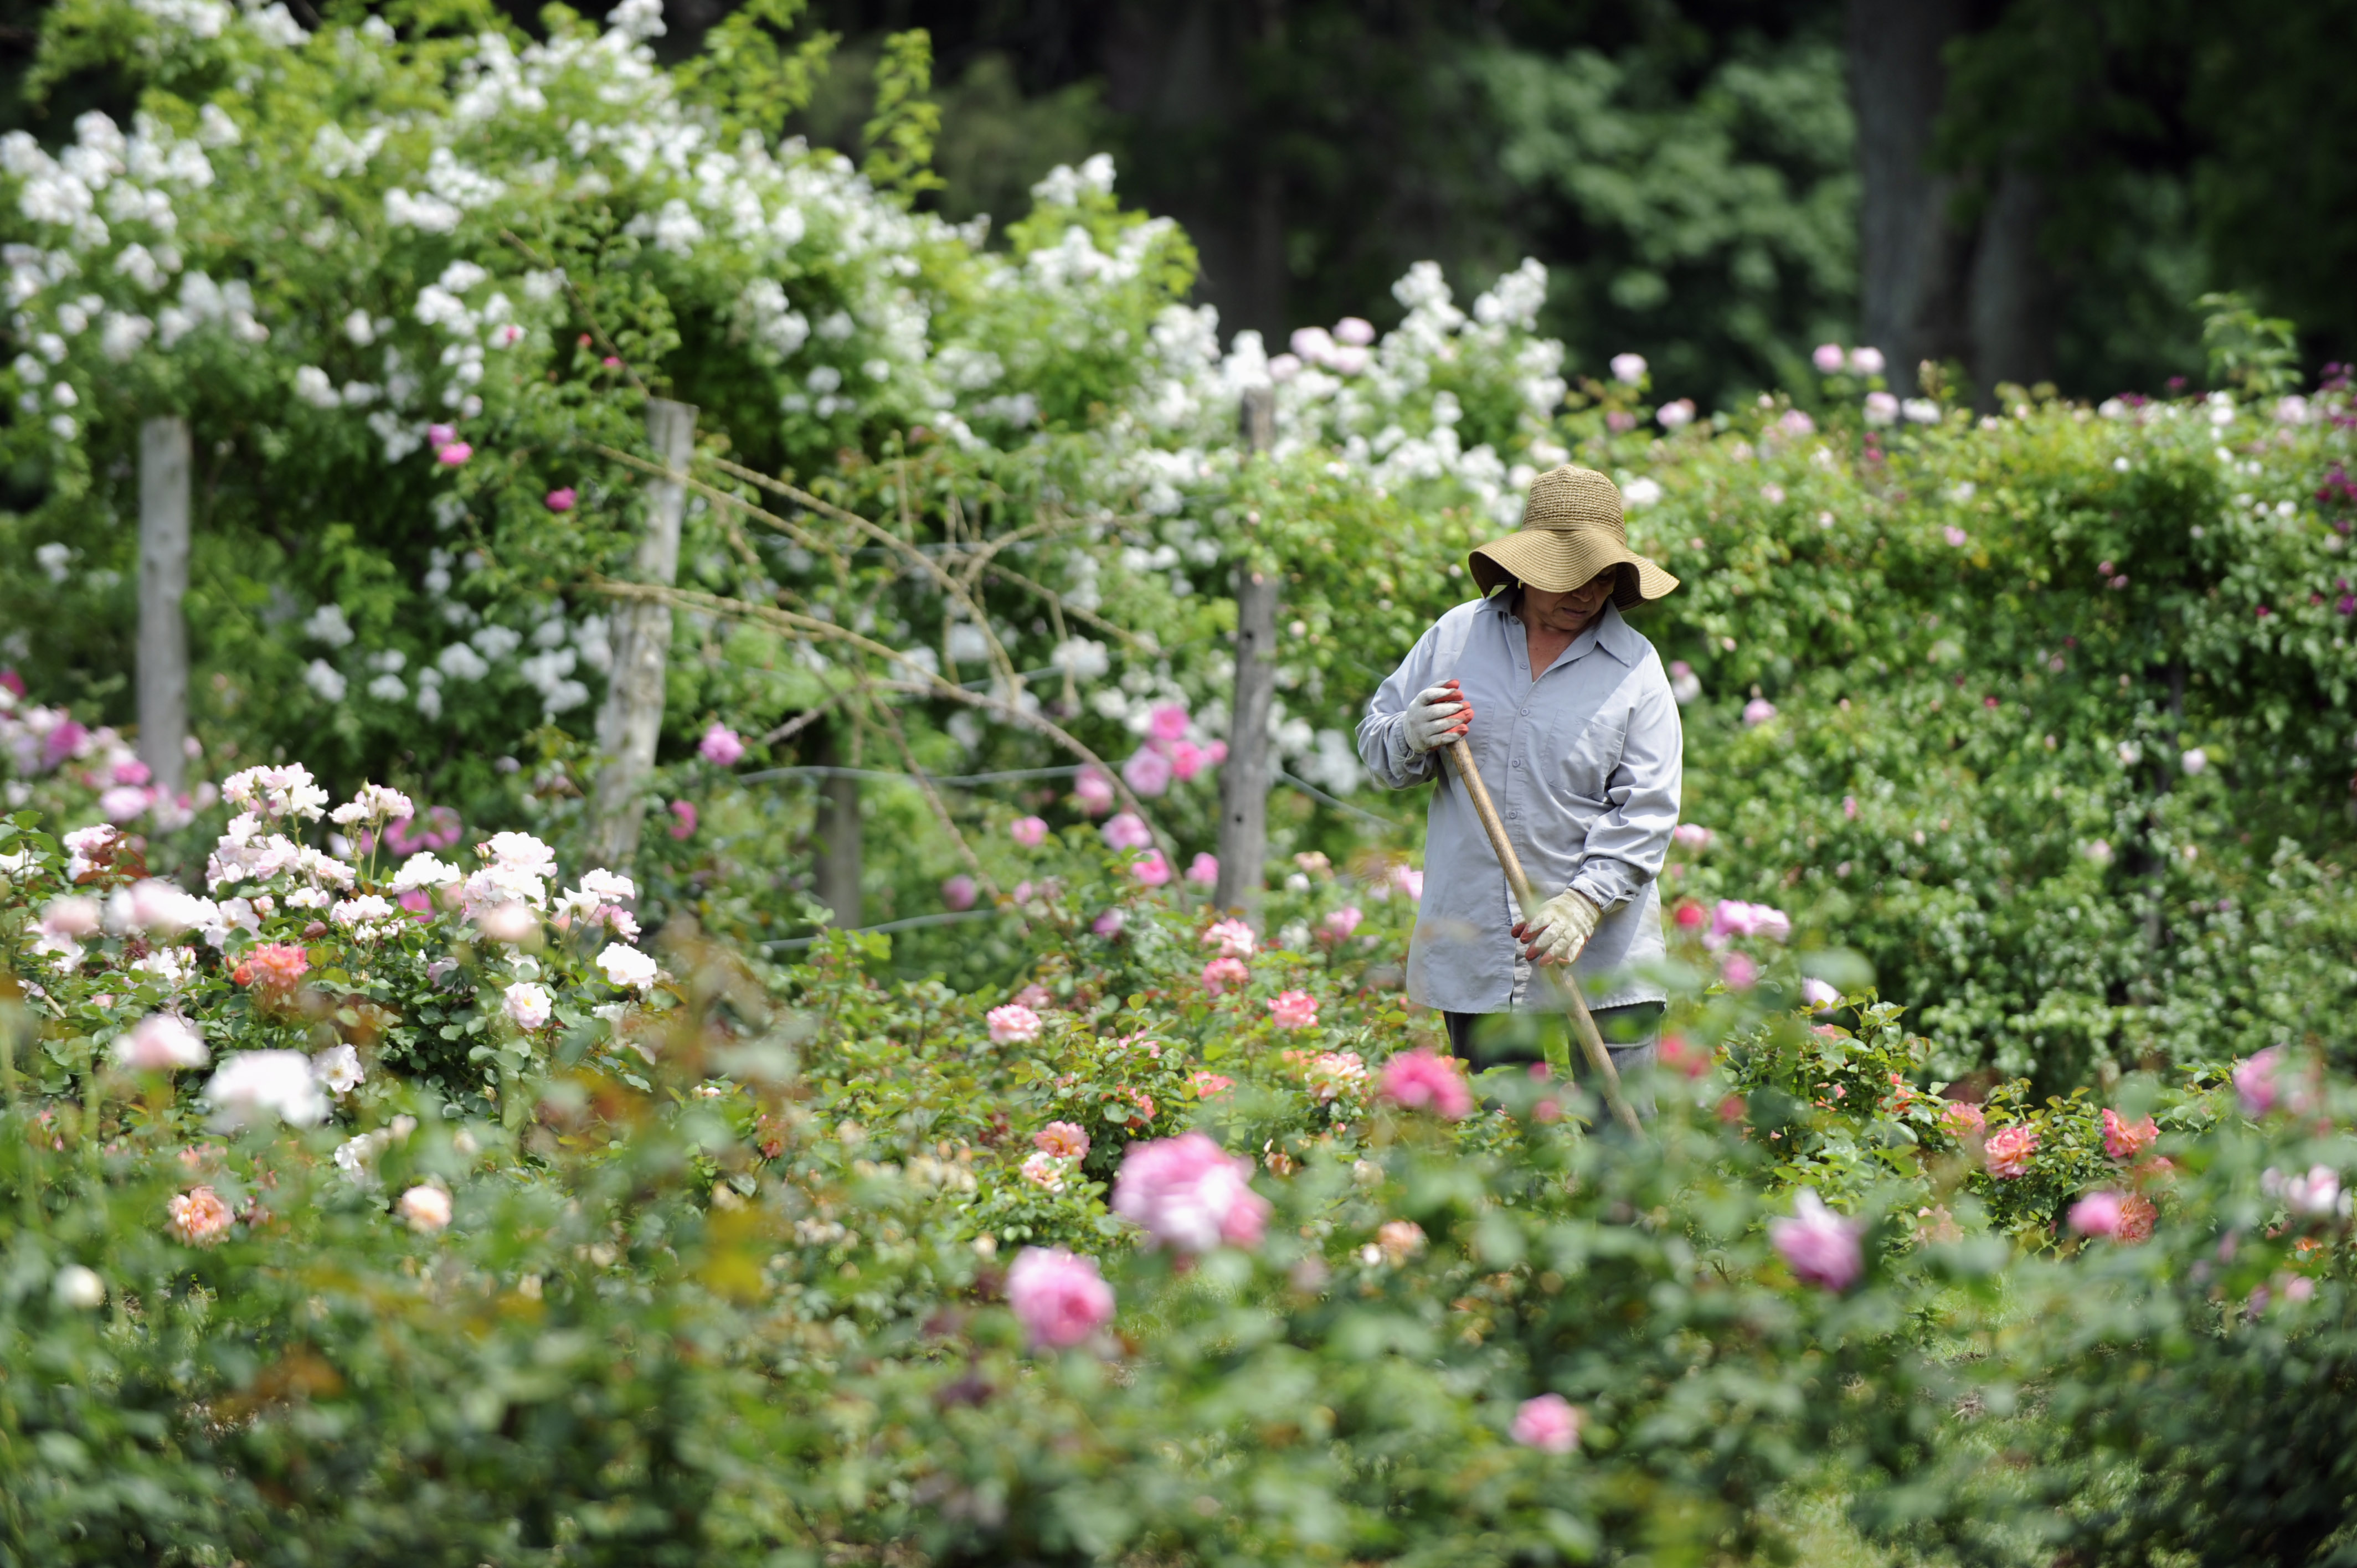 Rosalinda Salcedo tends to roses in Elizabeth Park in Hartford, Conn., Wednesday, June 8, 2011.